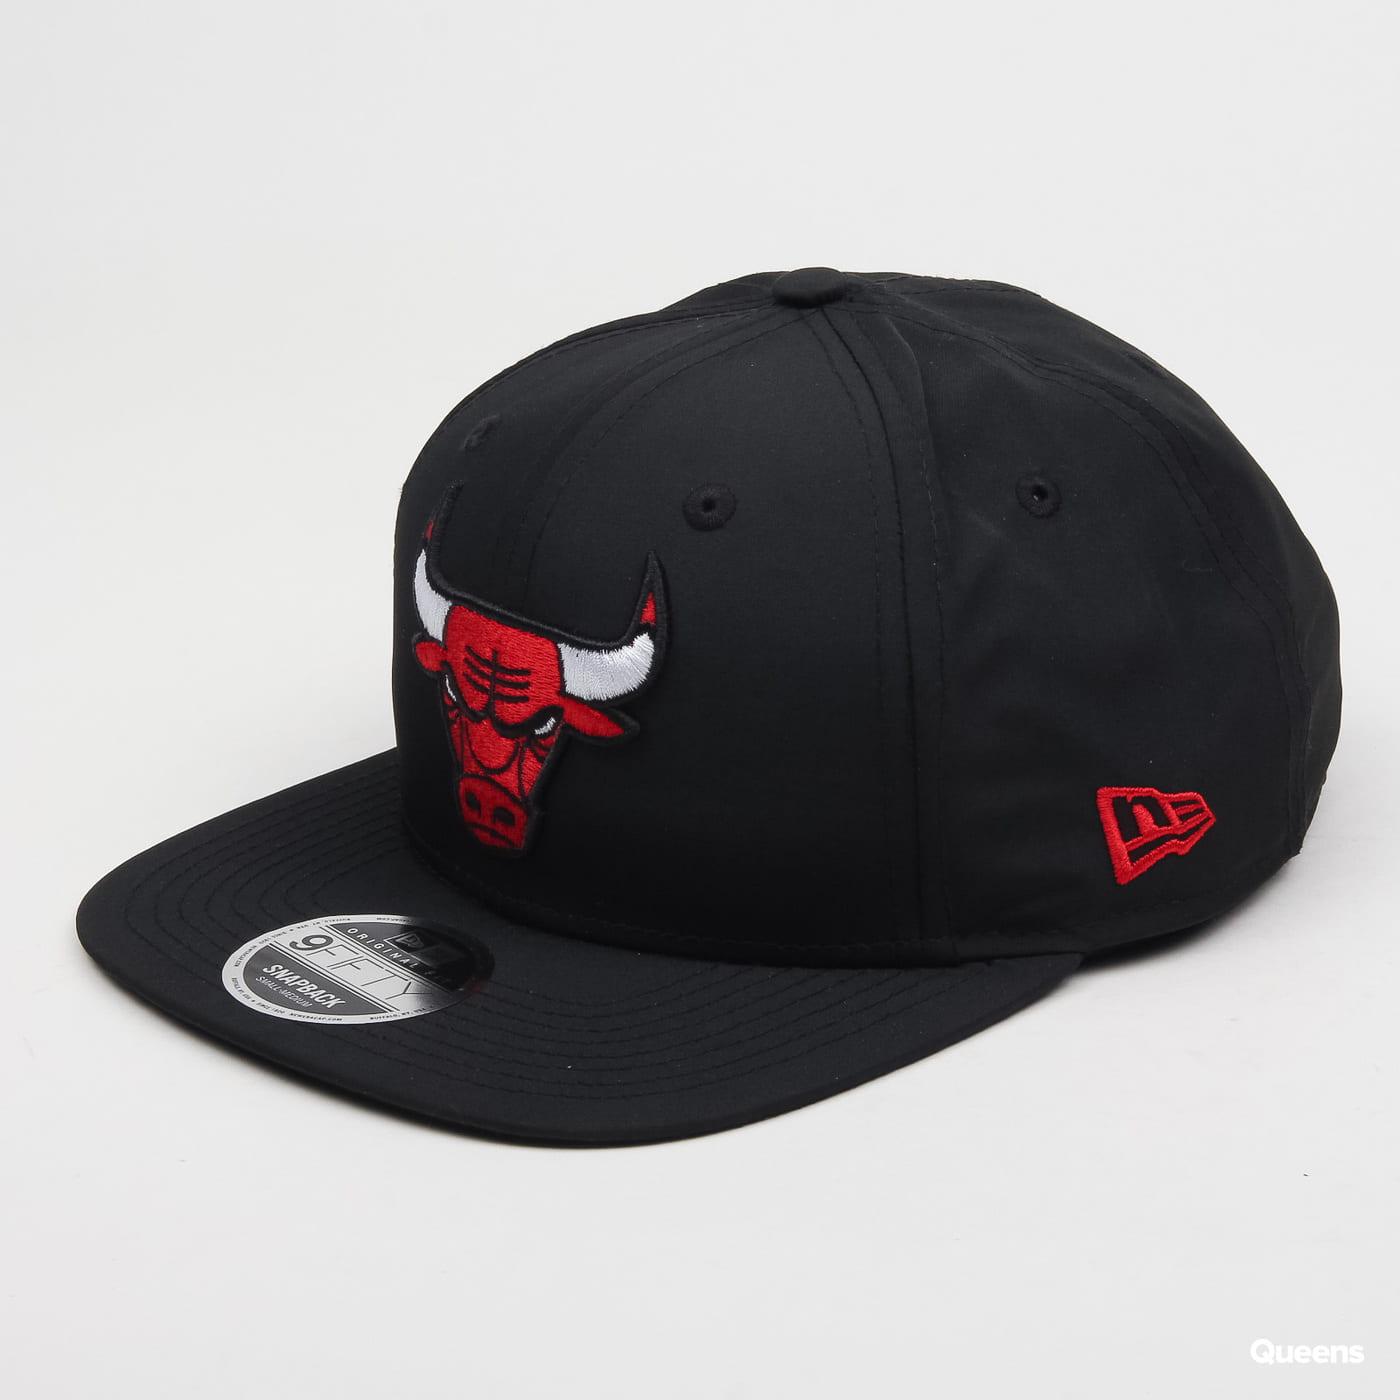 finest selection b0649 53406 Snapback New Era 950 Featherweight NBA Chicago Bulls black (11941680) –  Queens 💚